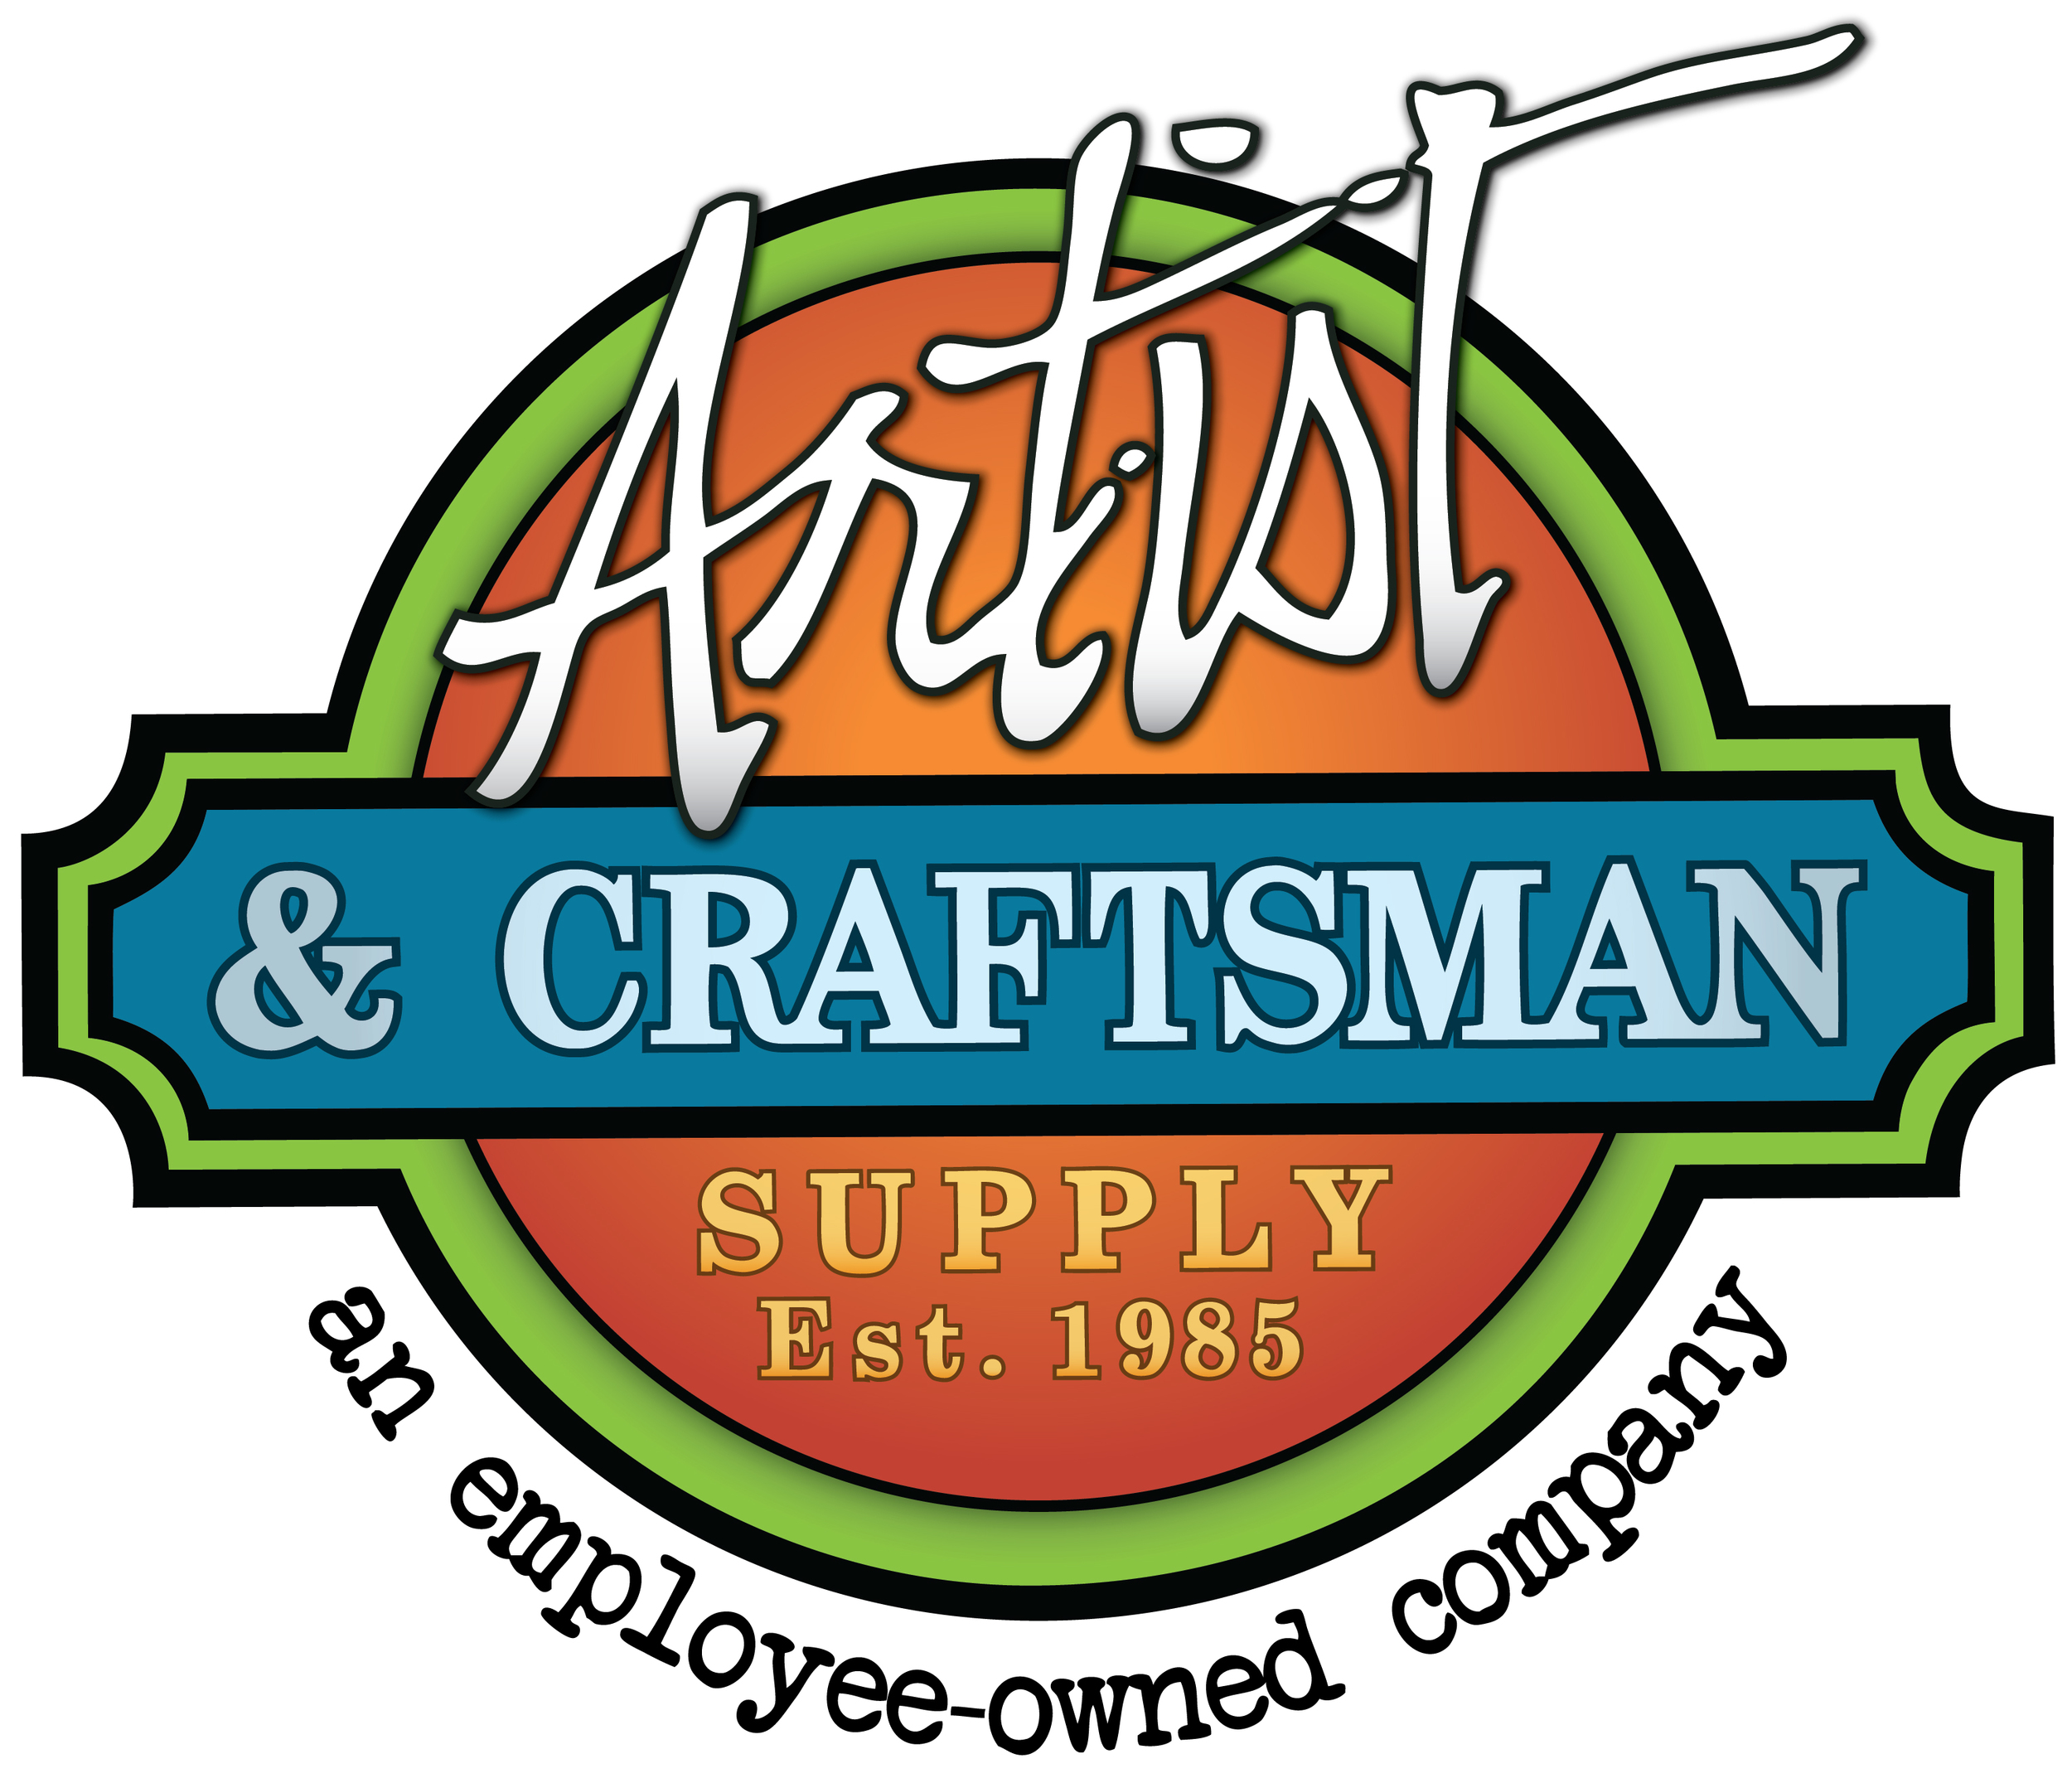 Artist and craftsman supply